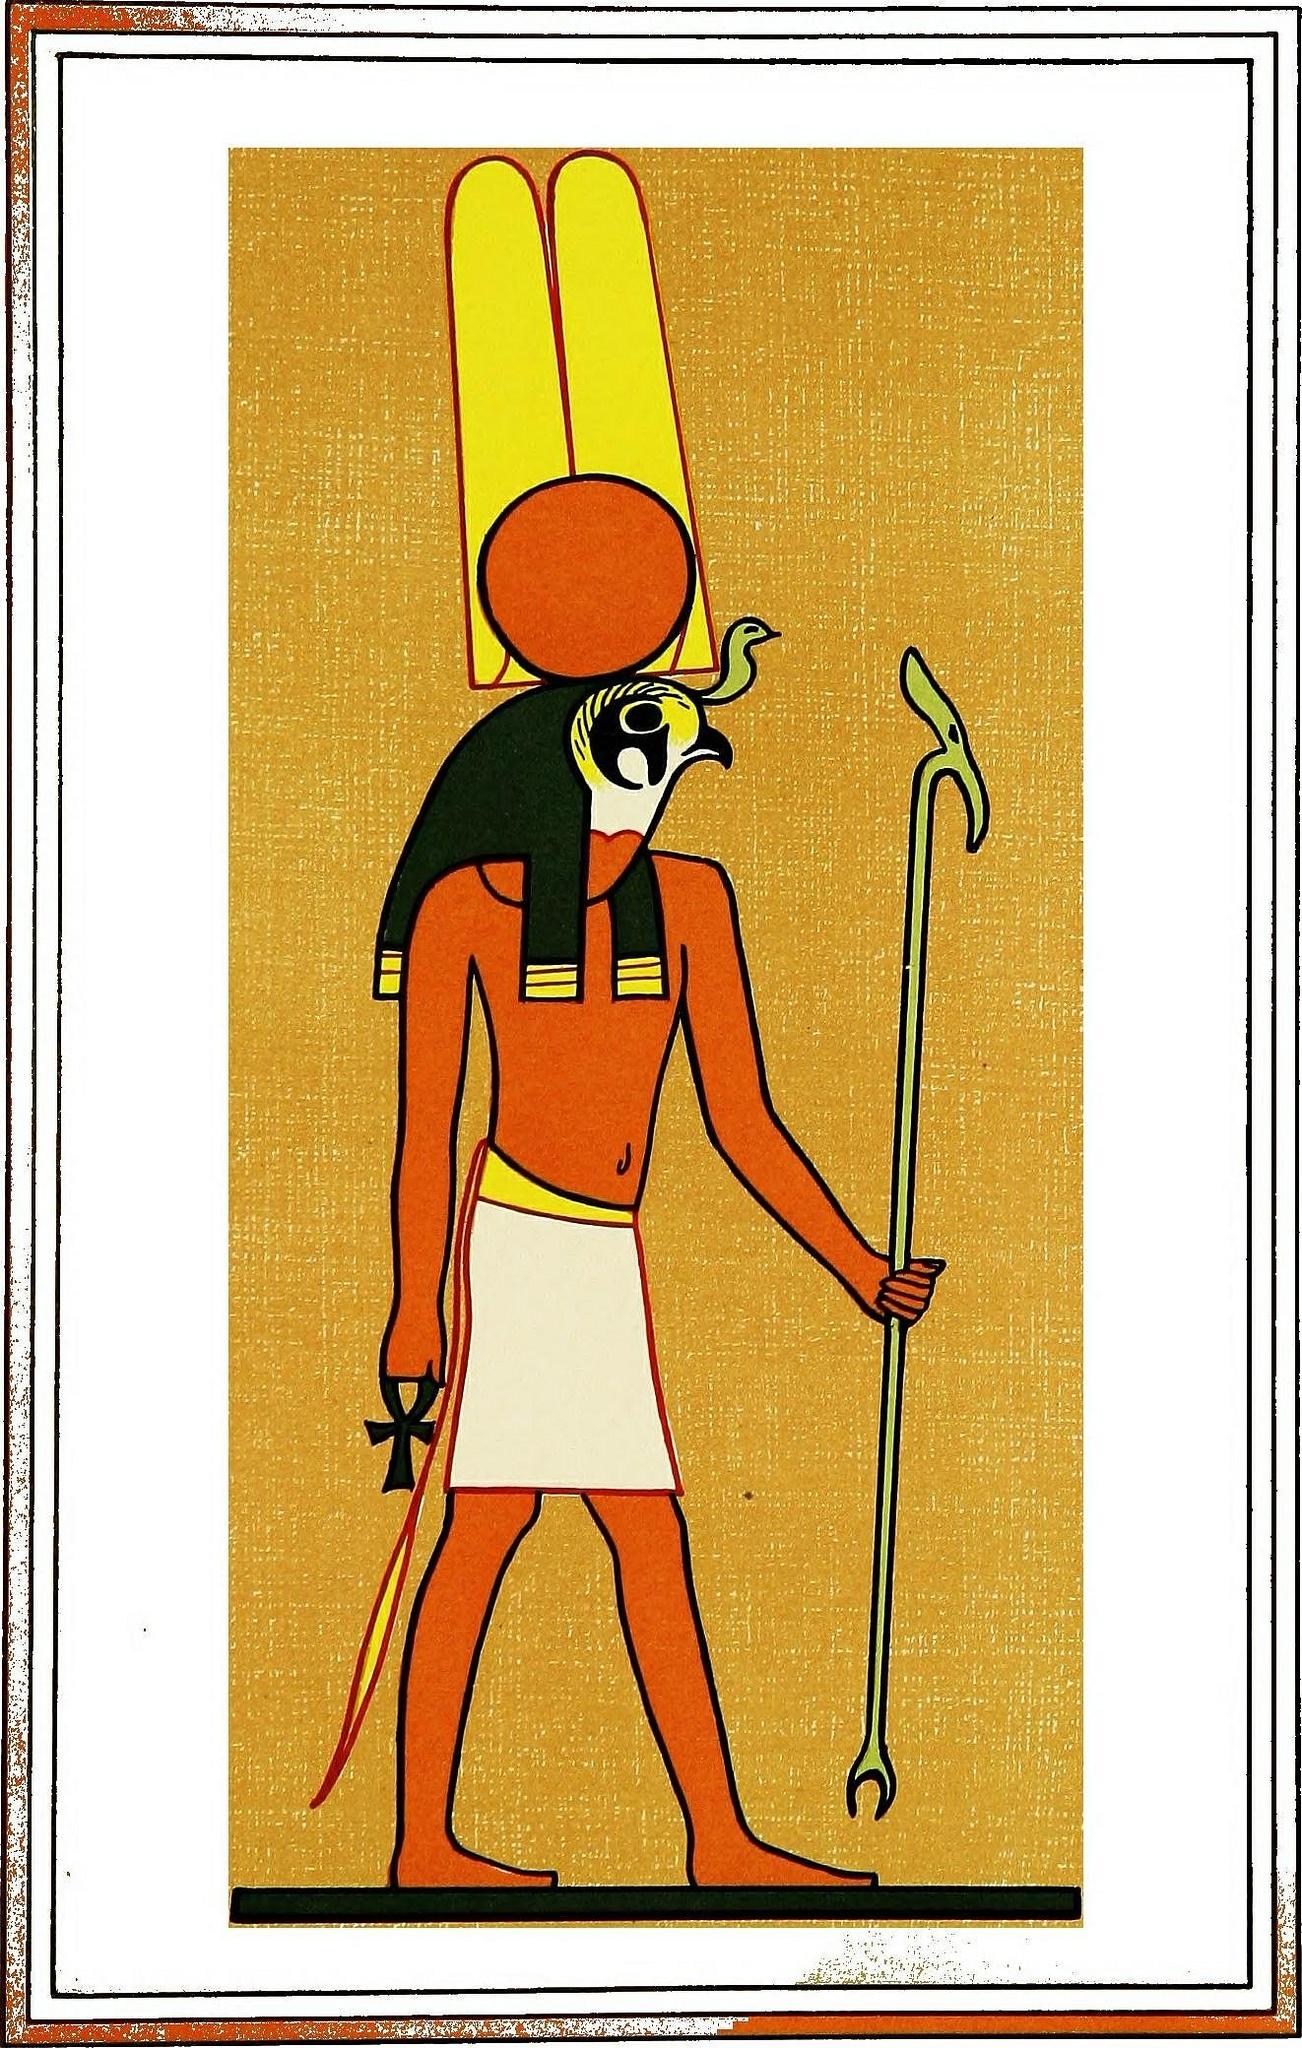 Audiolibro : Cuentos Orientales : Osiris